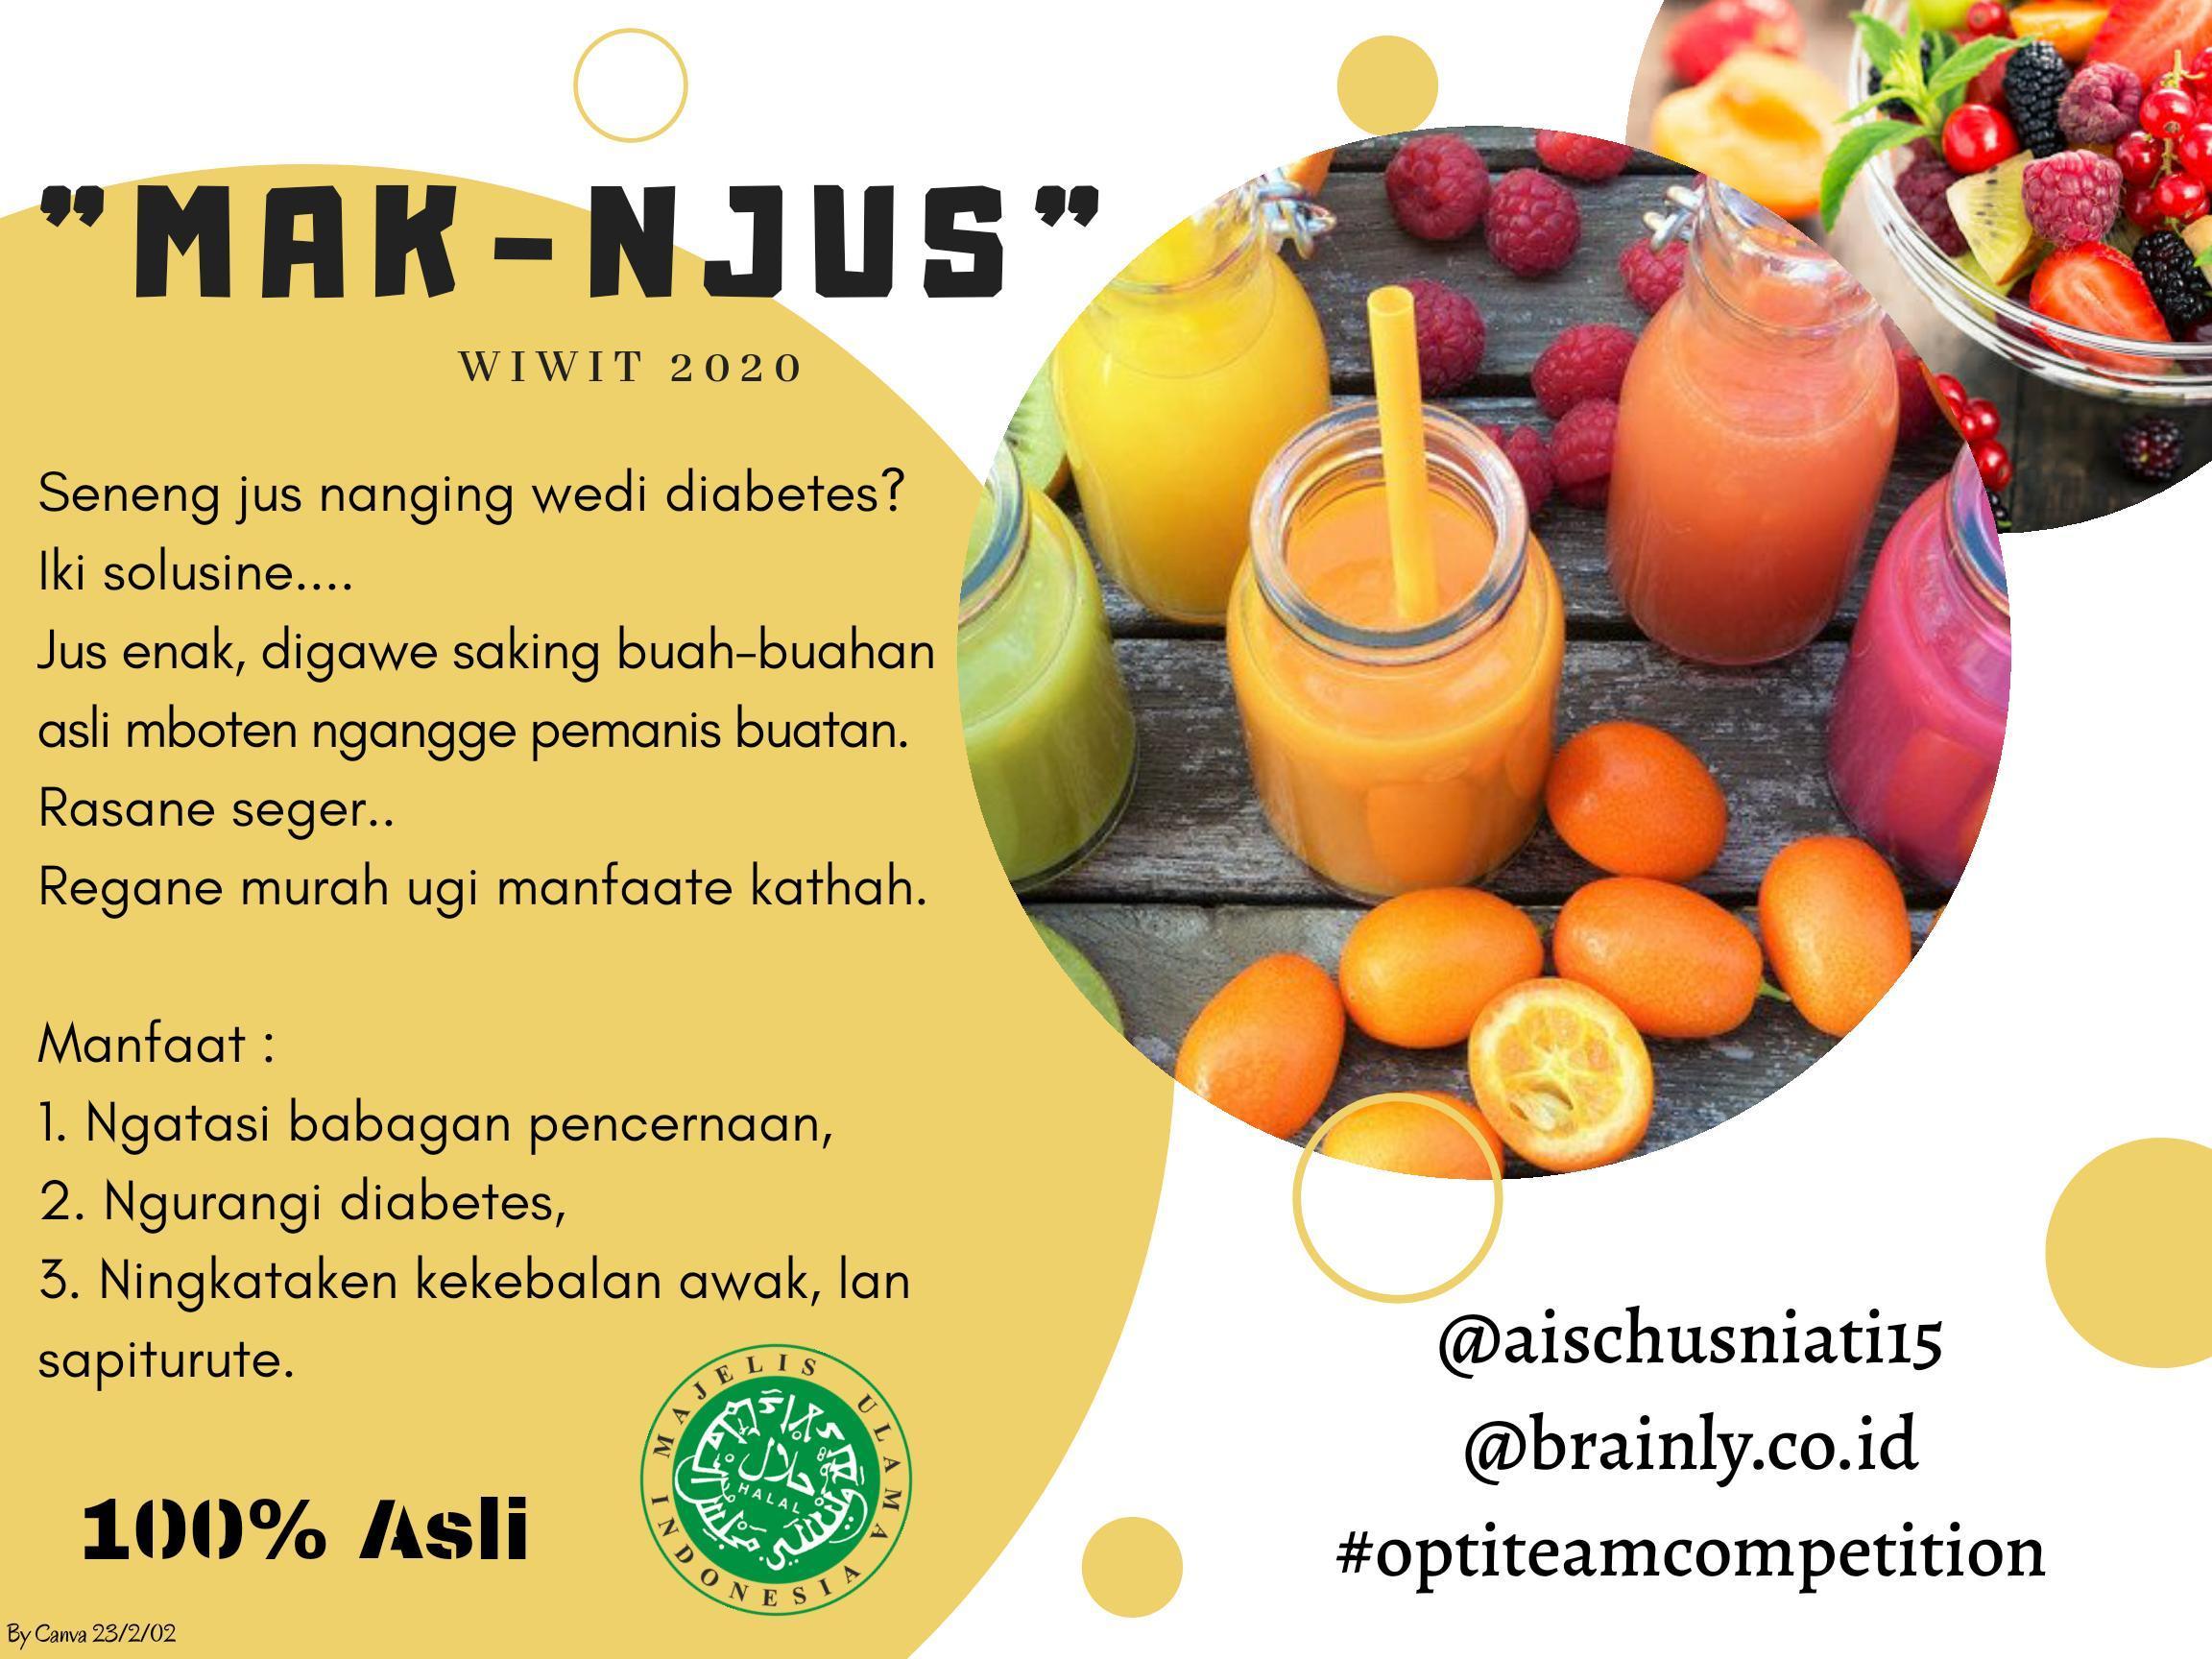 Contoh Iklan Menggunakan Bahasa Jawa Brainly Co Id